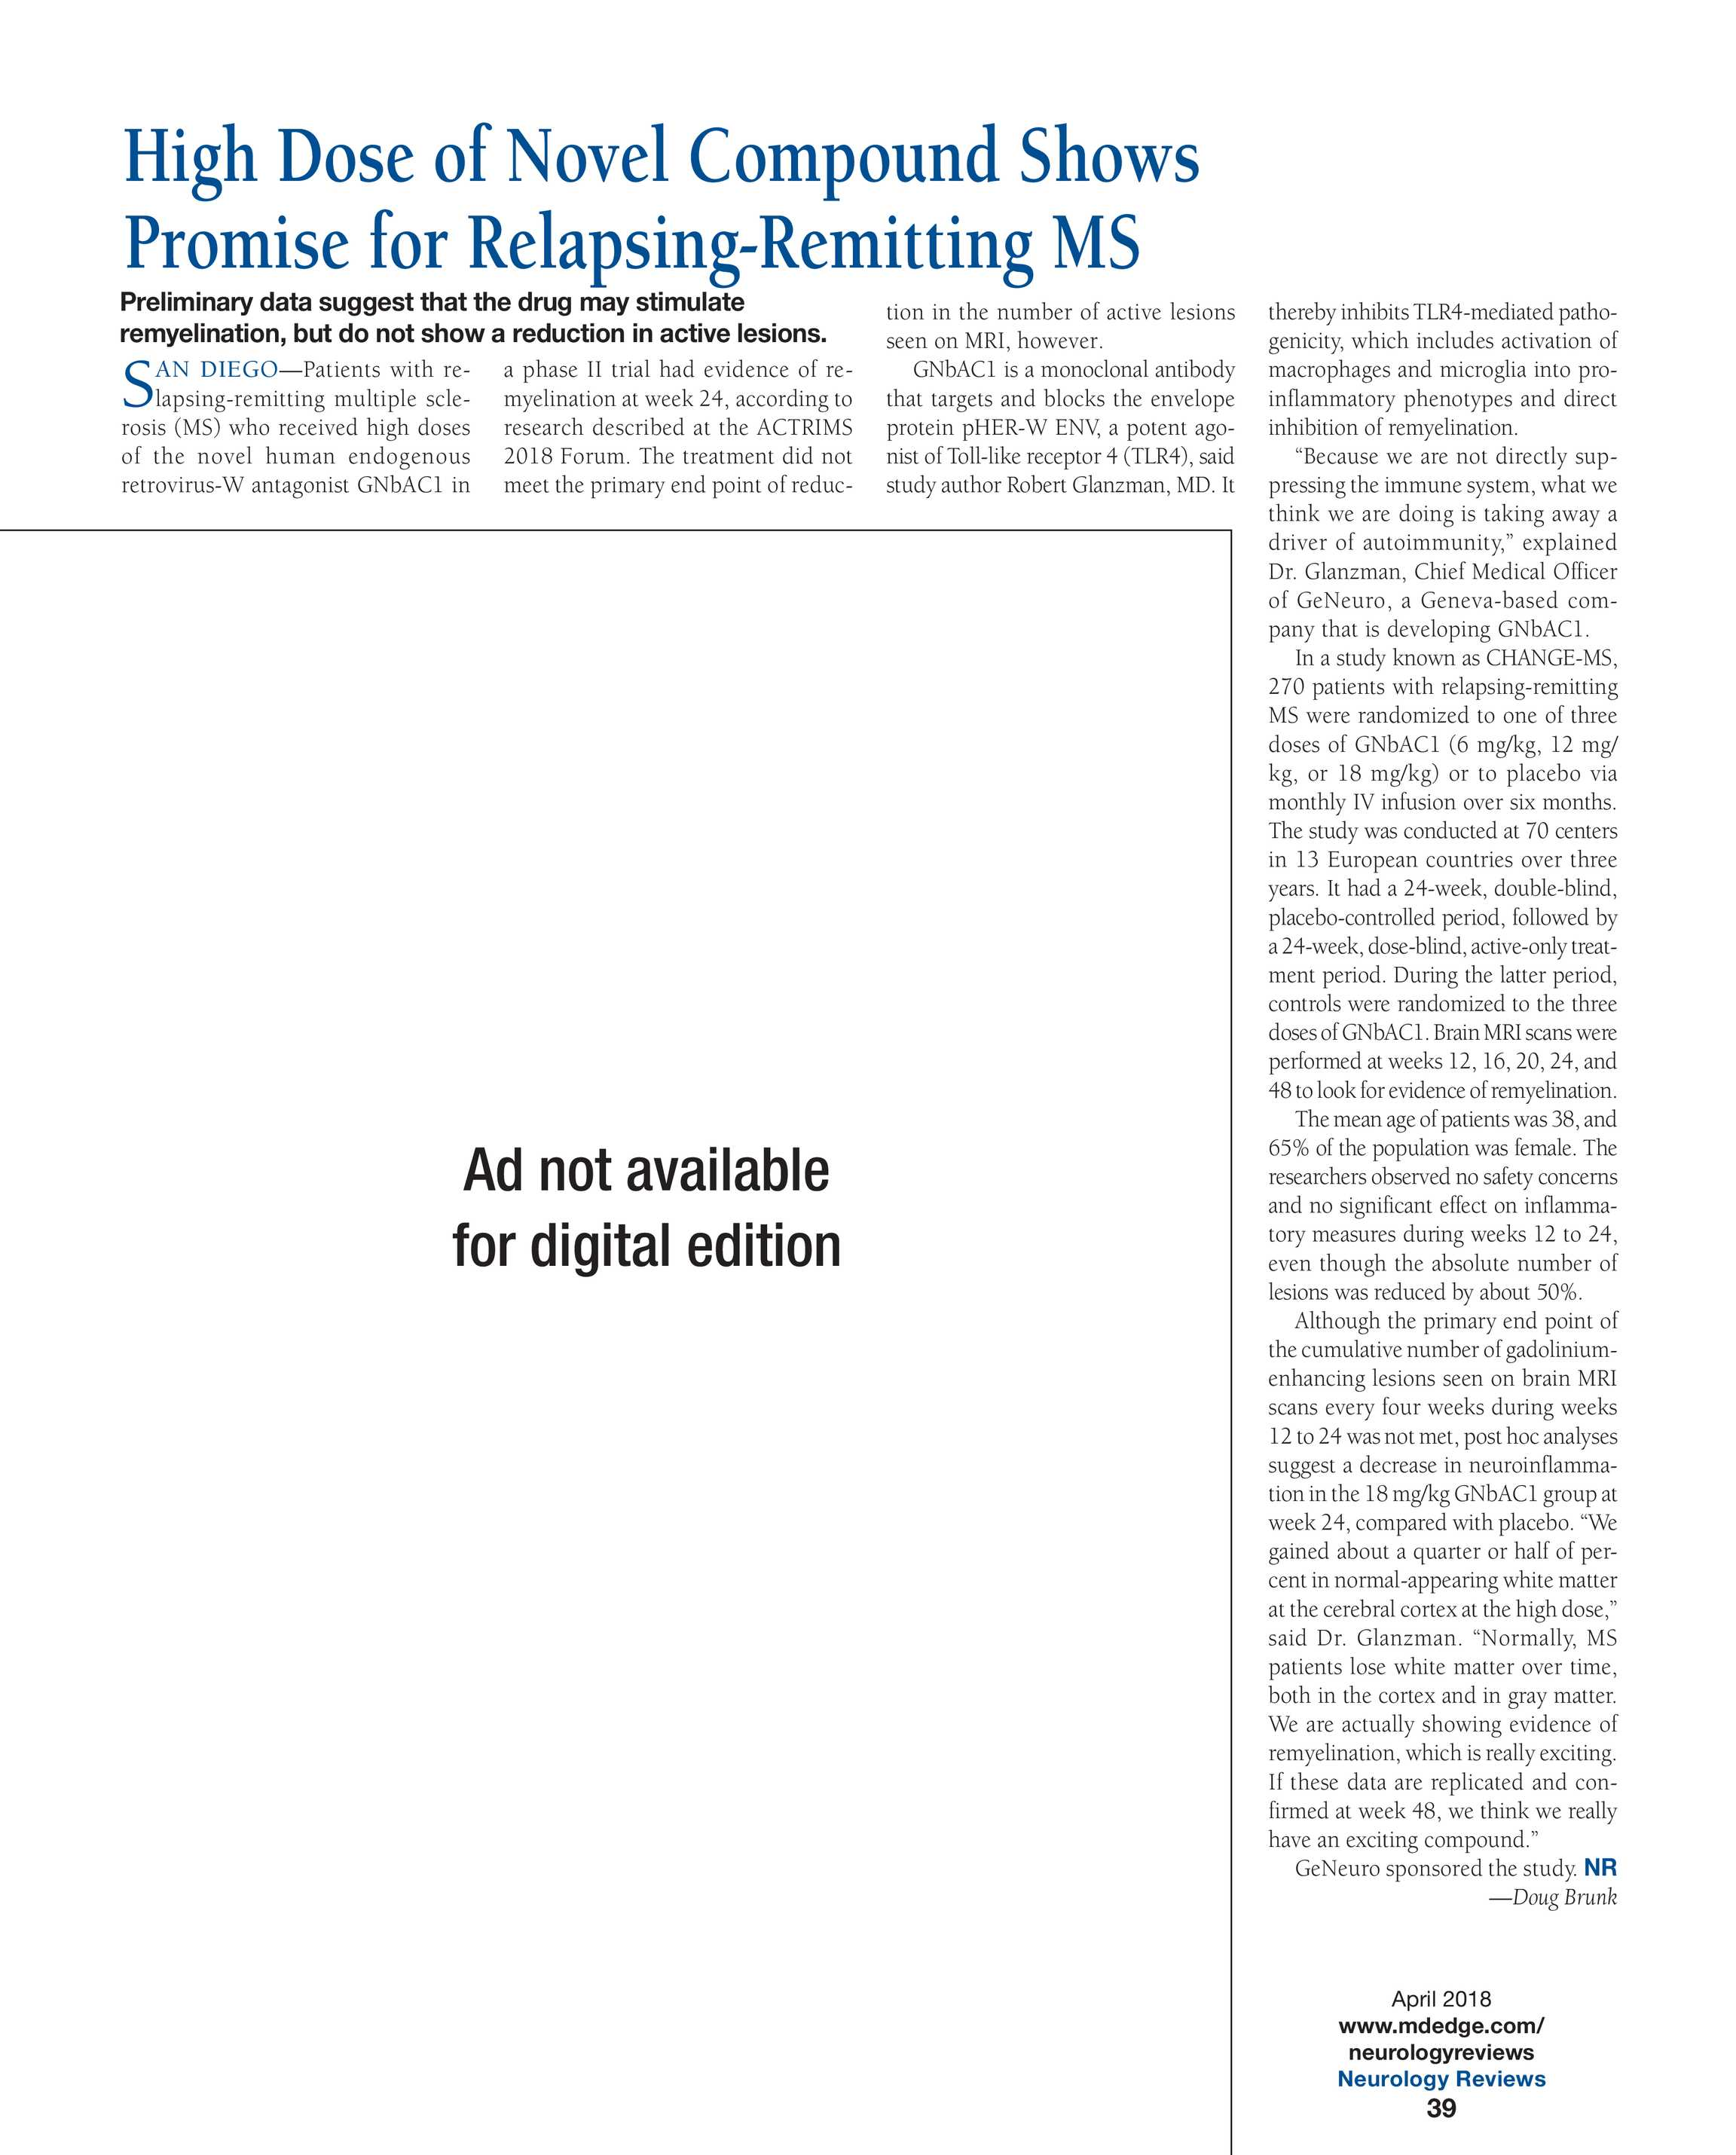 Neurology Reviews - NR April 2018 - page 35